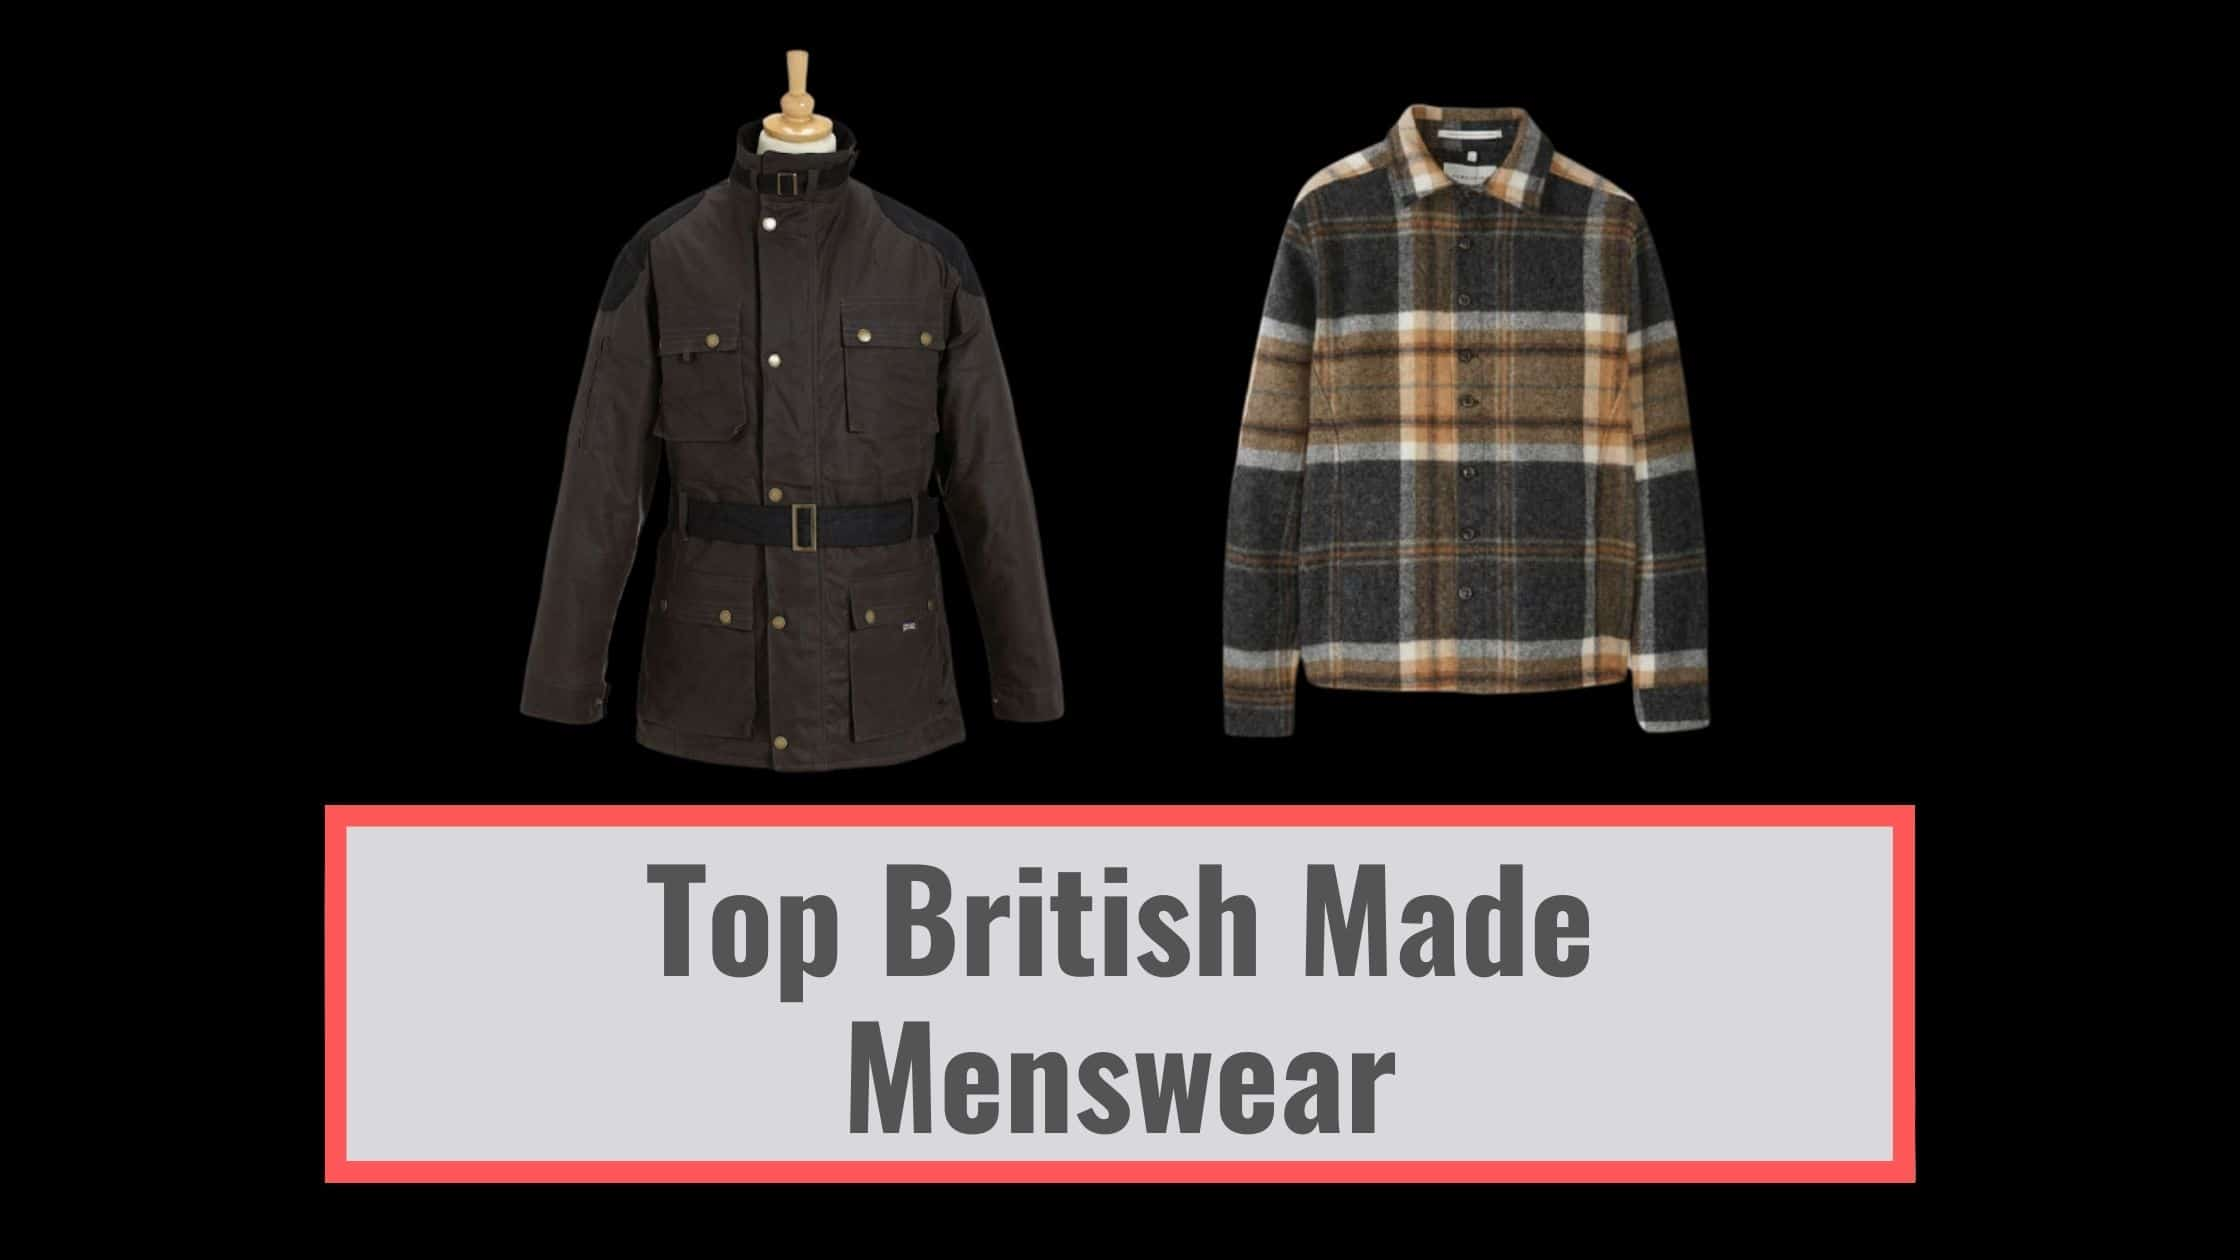 Top British Made Menswear